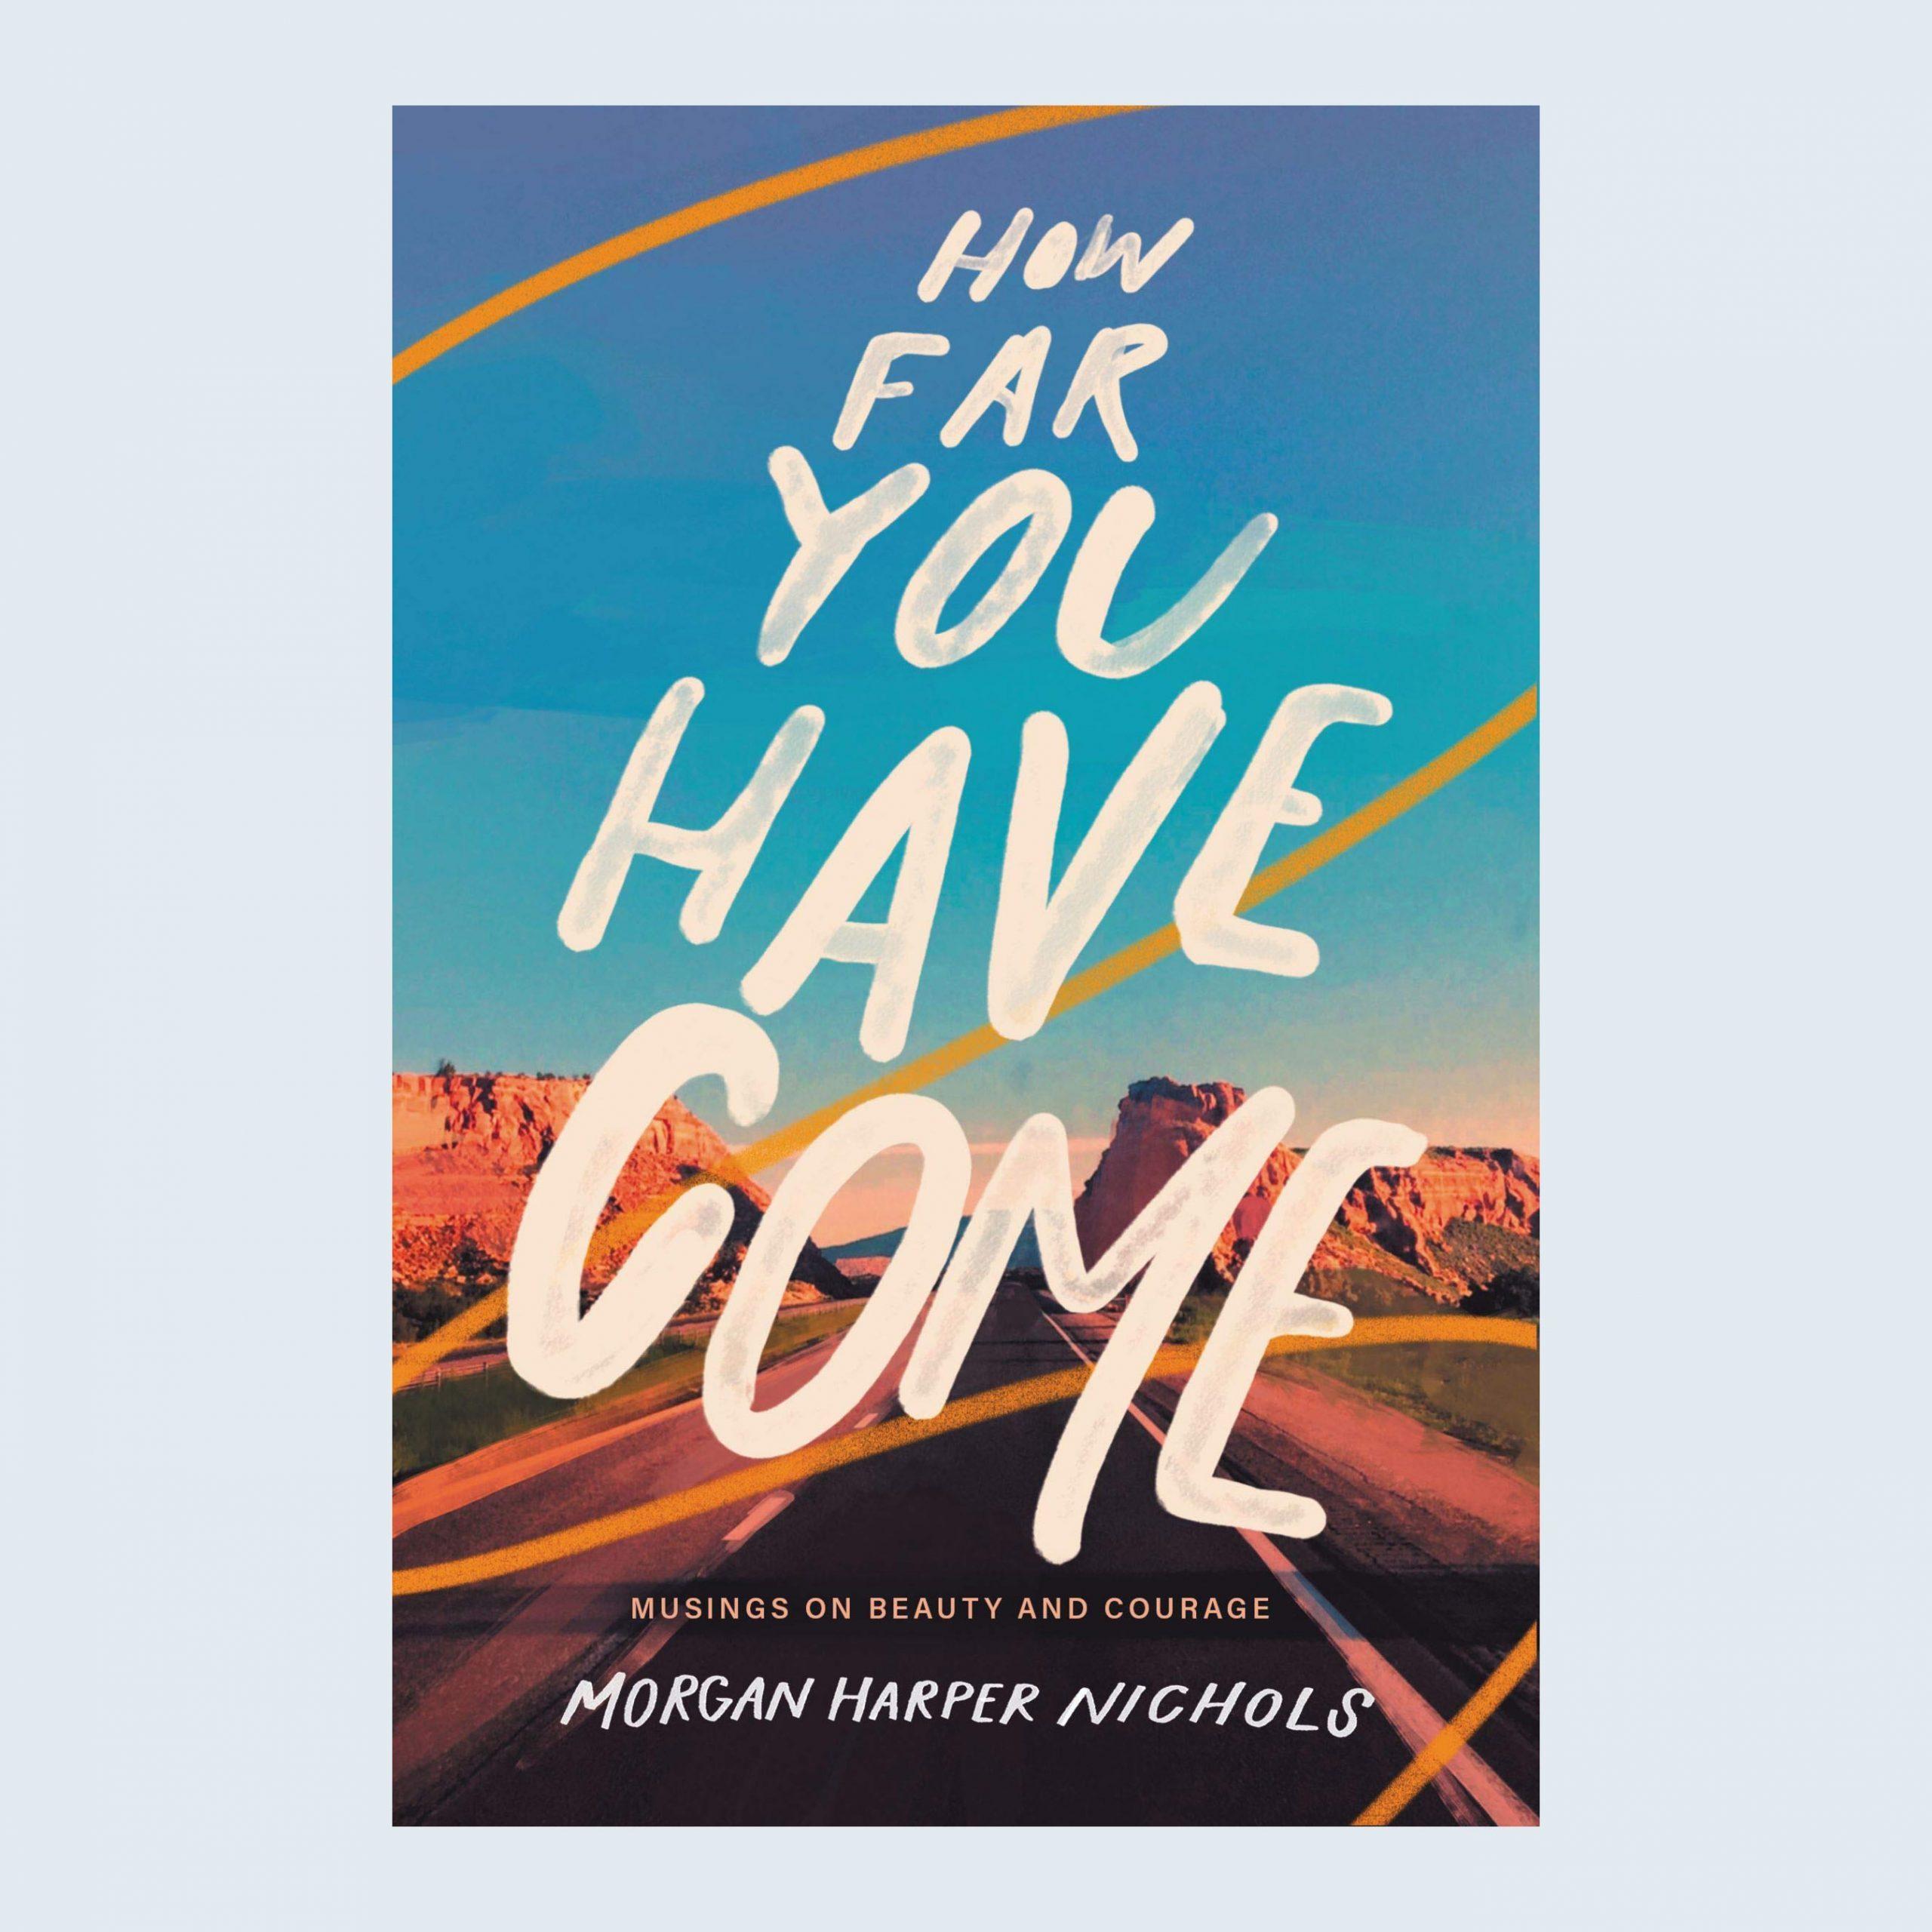 How Far You Have Come by Morgan Harper Nichols